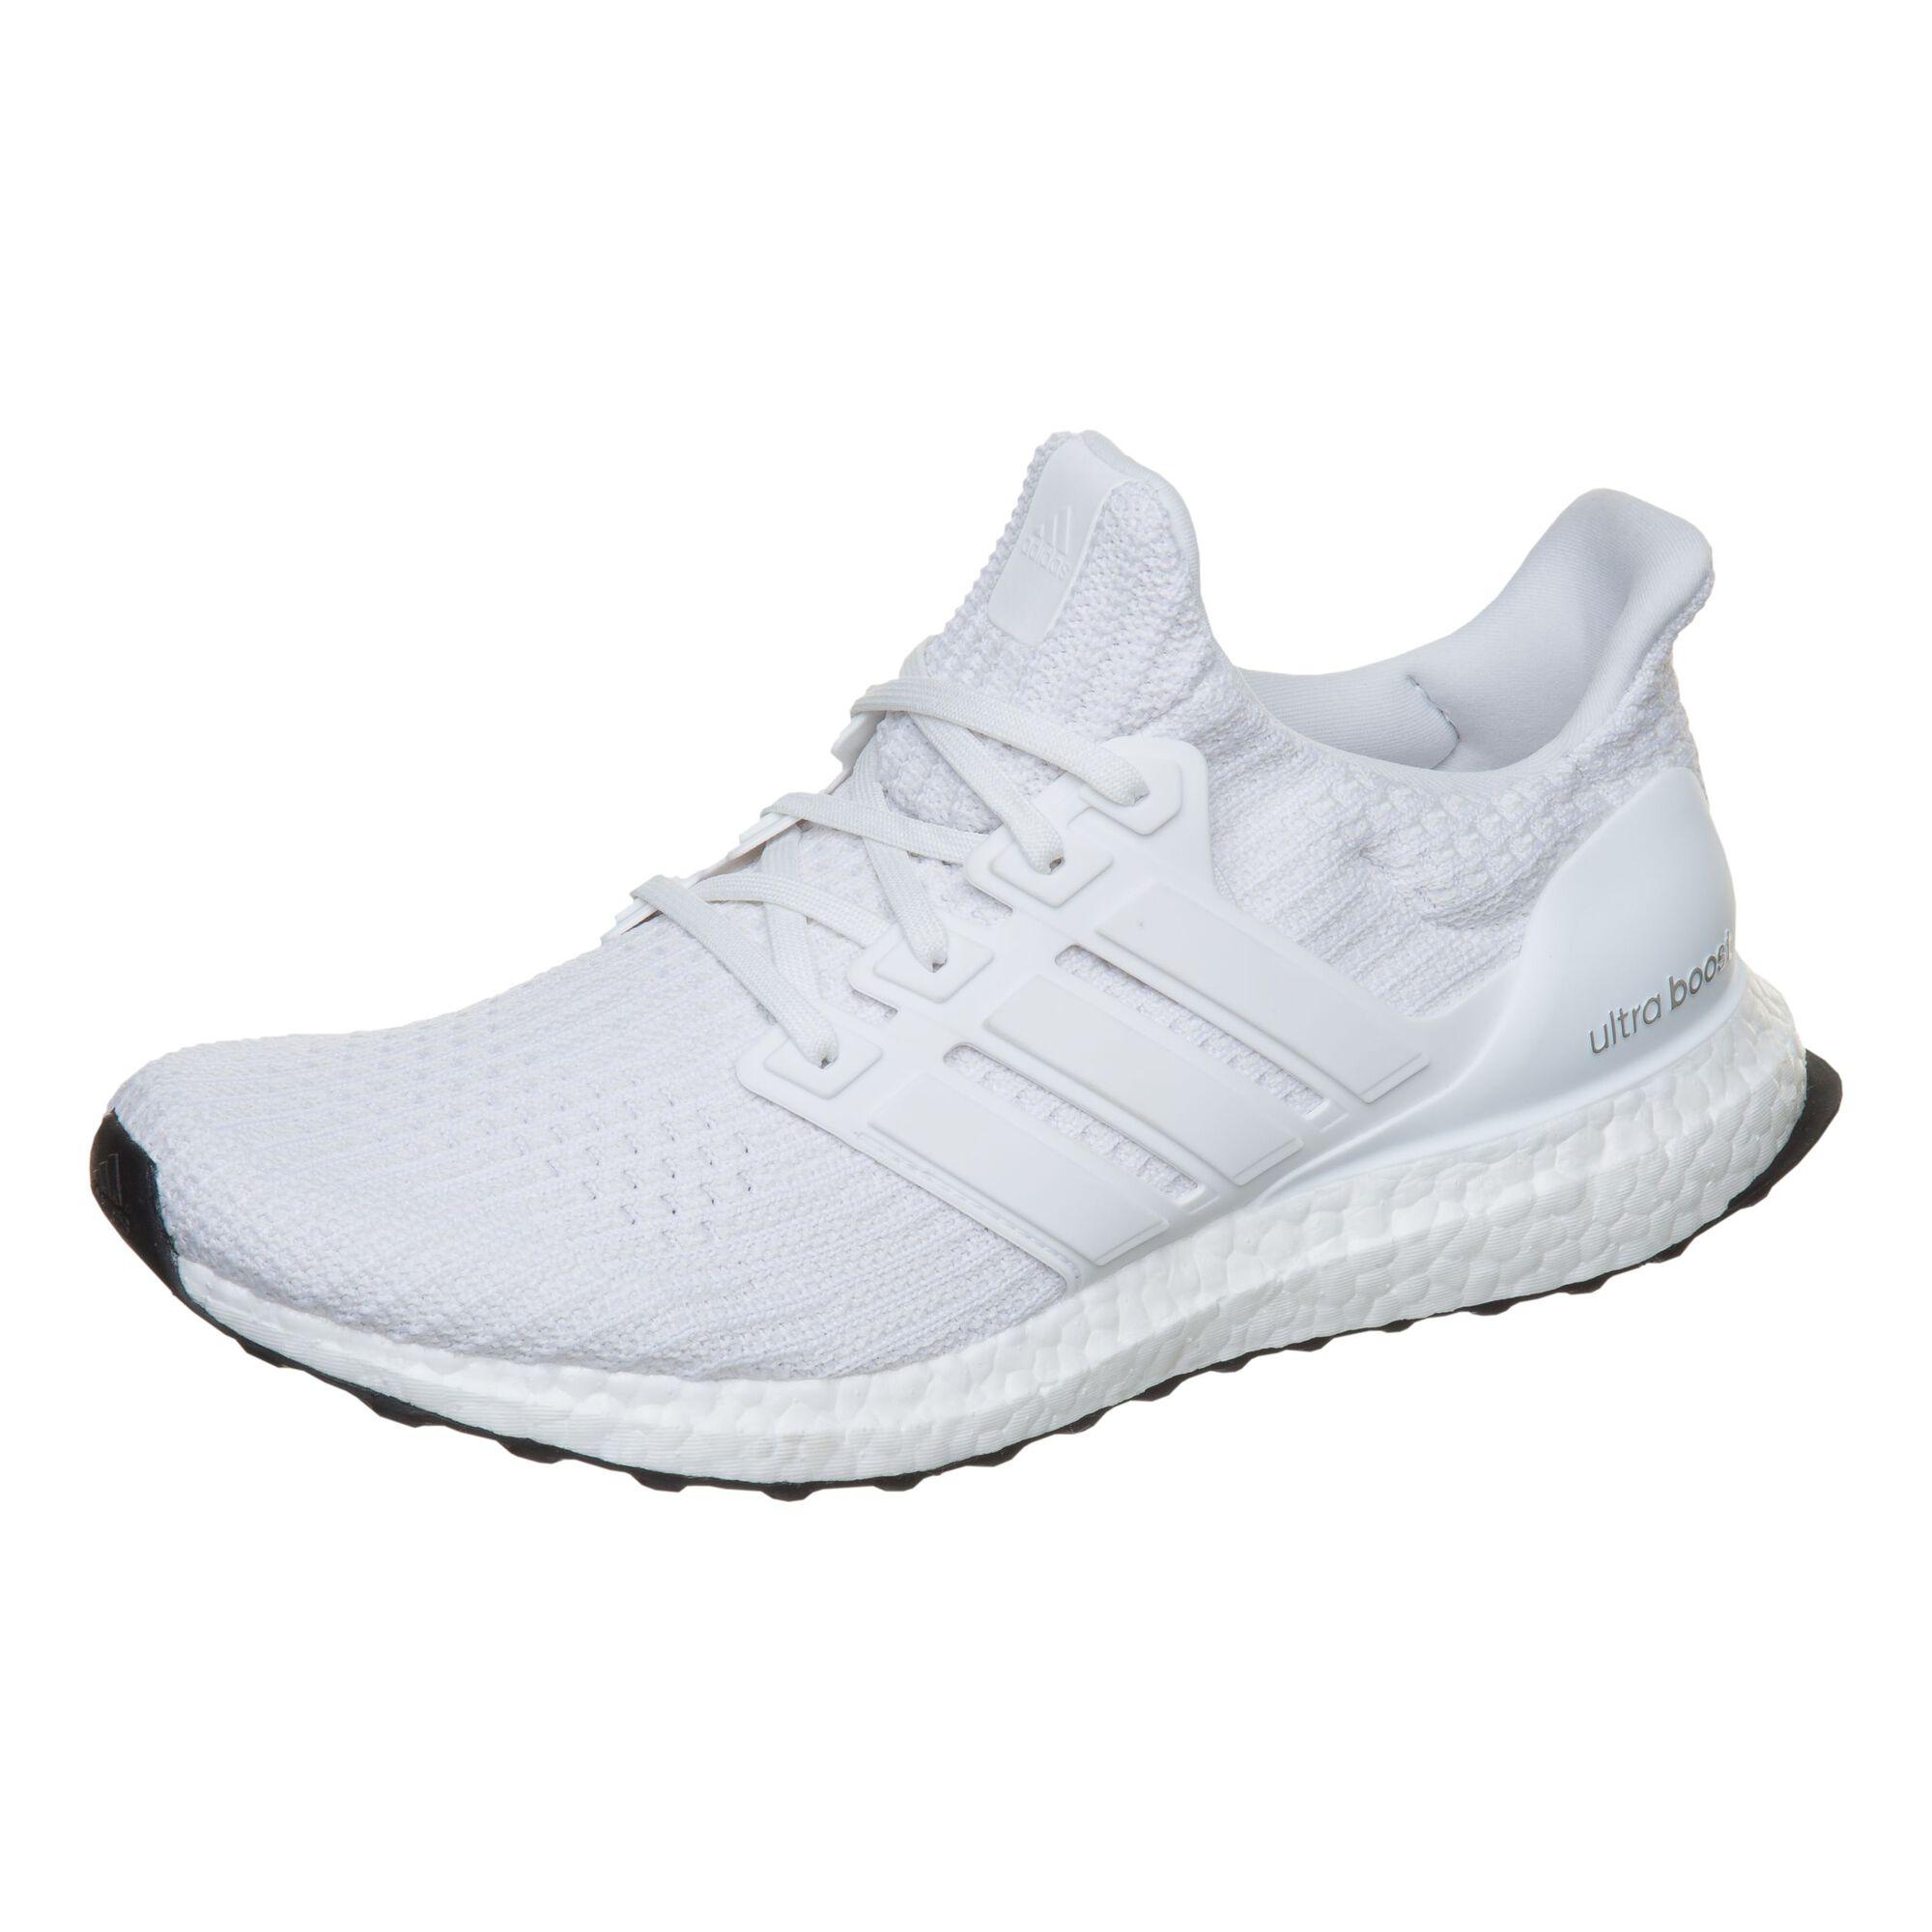 5a192e87e buy adidas Ultra Boost Neutral Running Shoe Men - White online ...